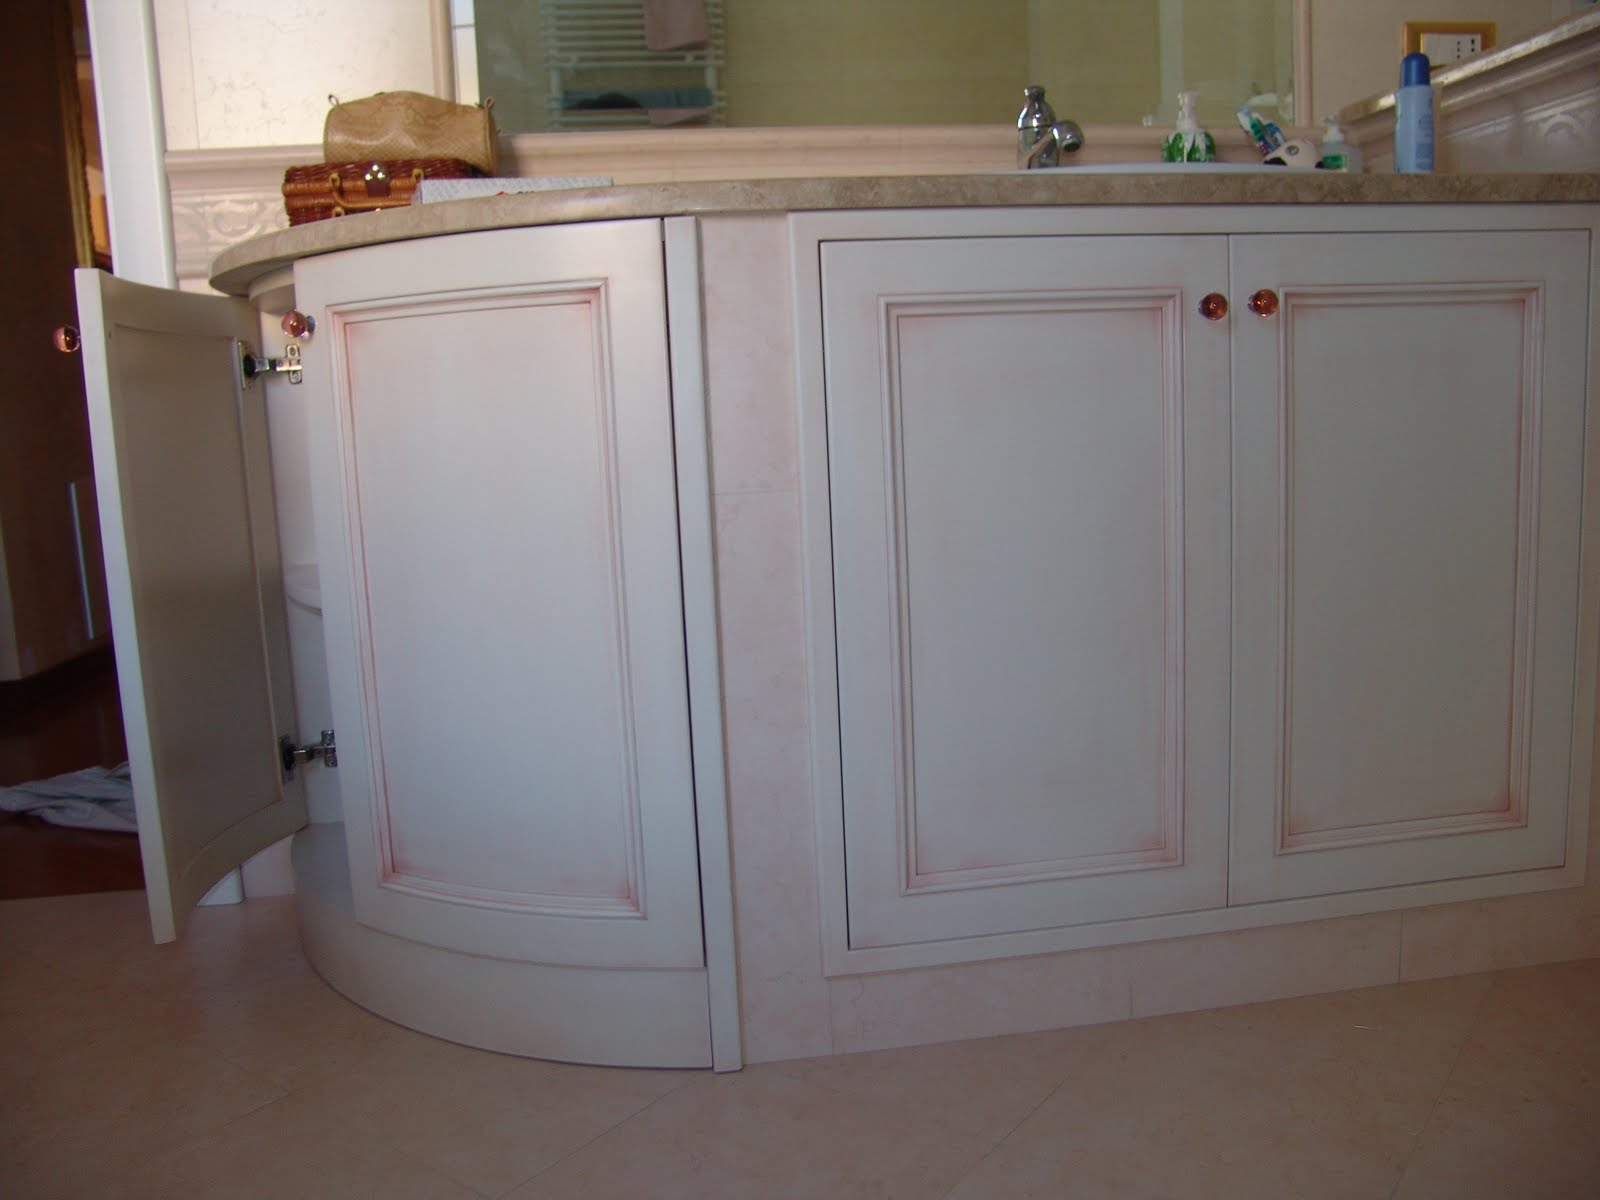 Artelegno mobili e accessori bagno in vari stili for Stili mobili